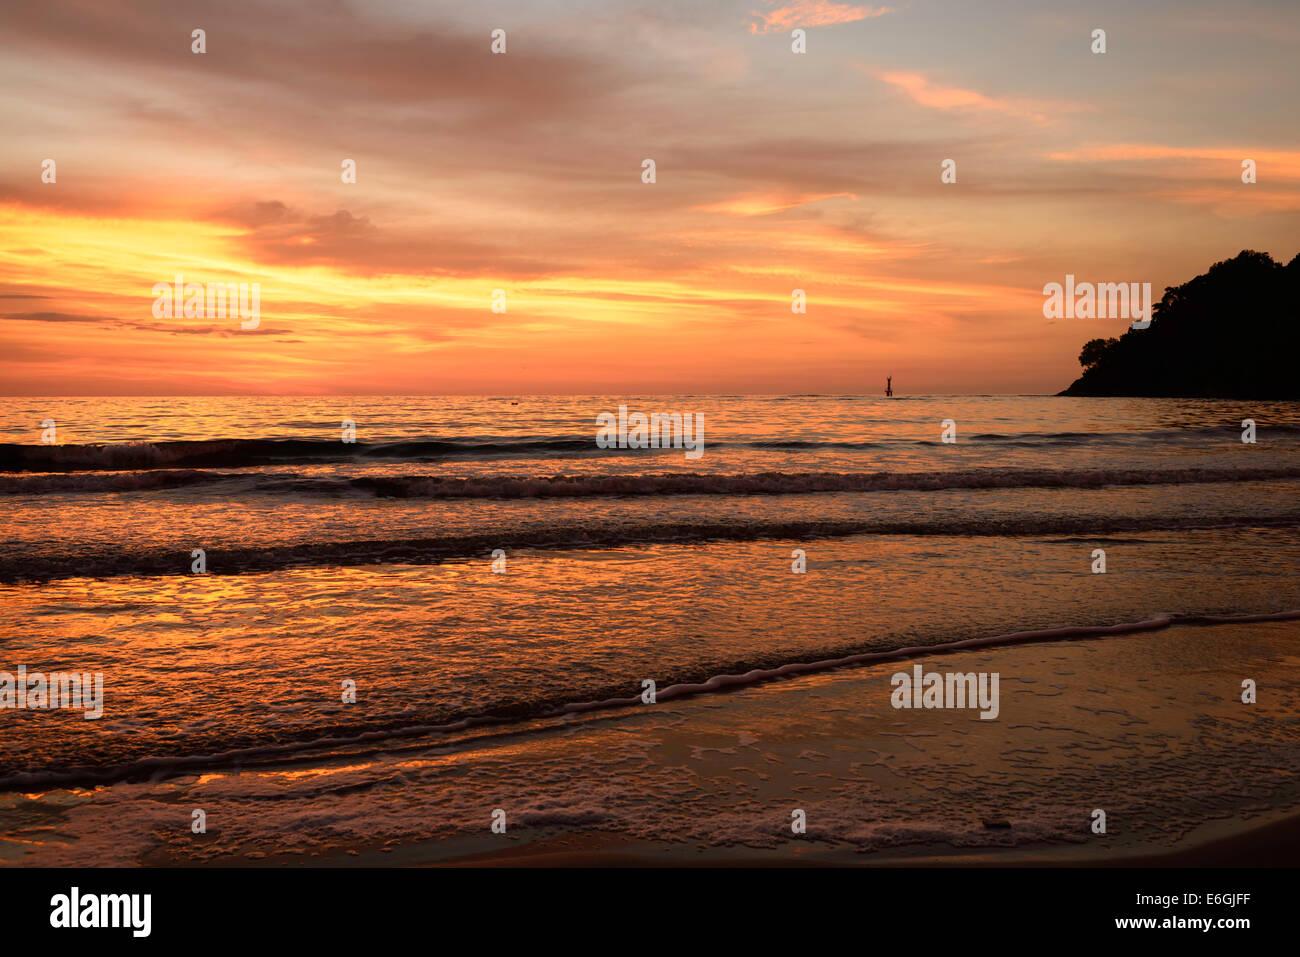 Sunset over Kota Kinabalu beach Borneo Malaysia - Stock Image